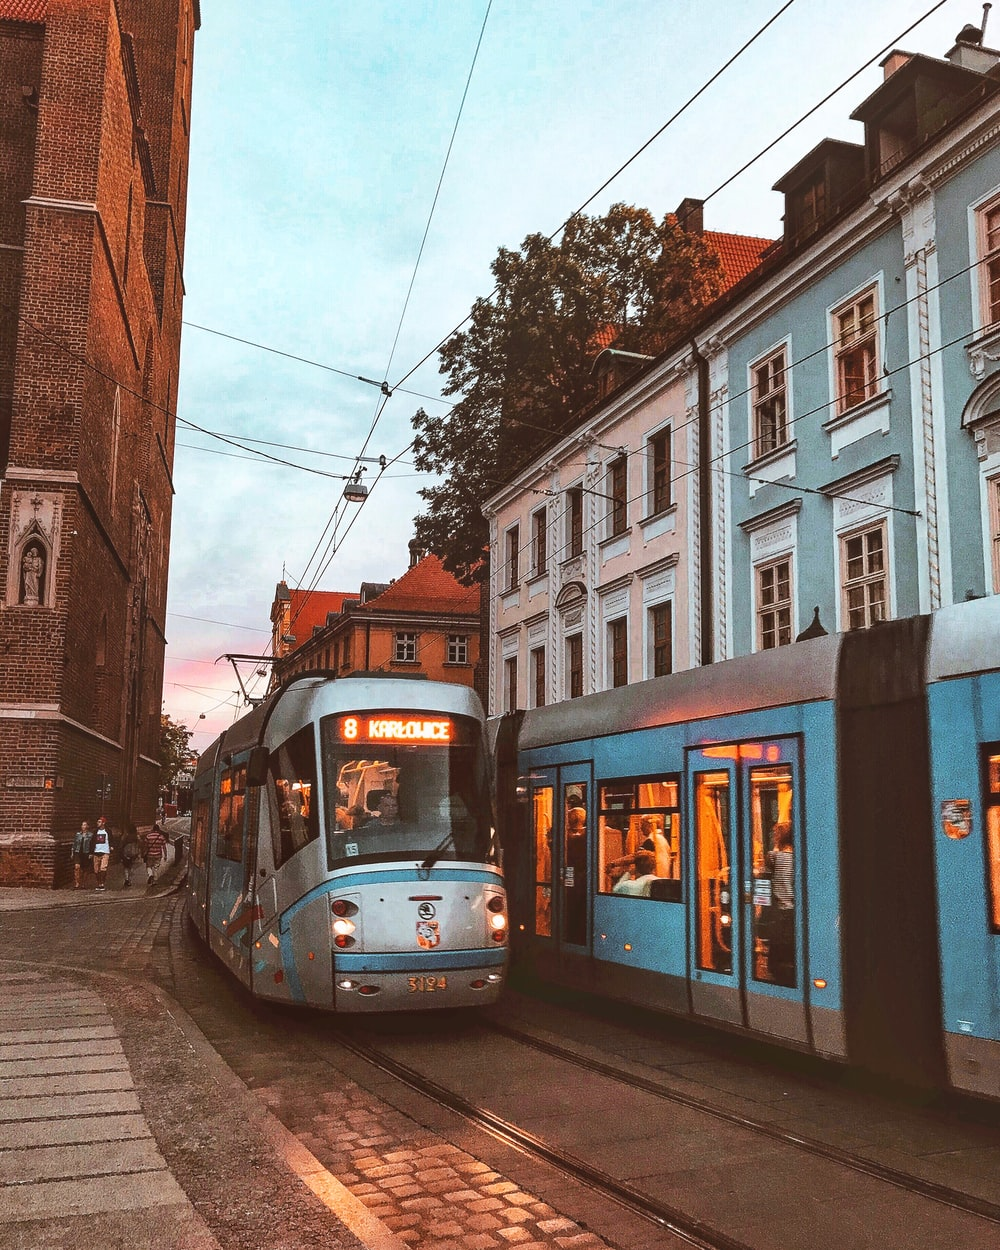 trams in city